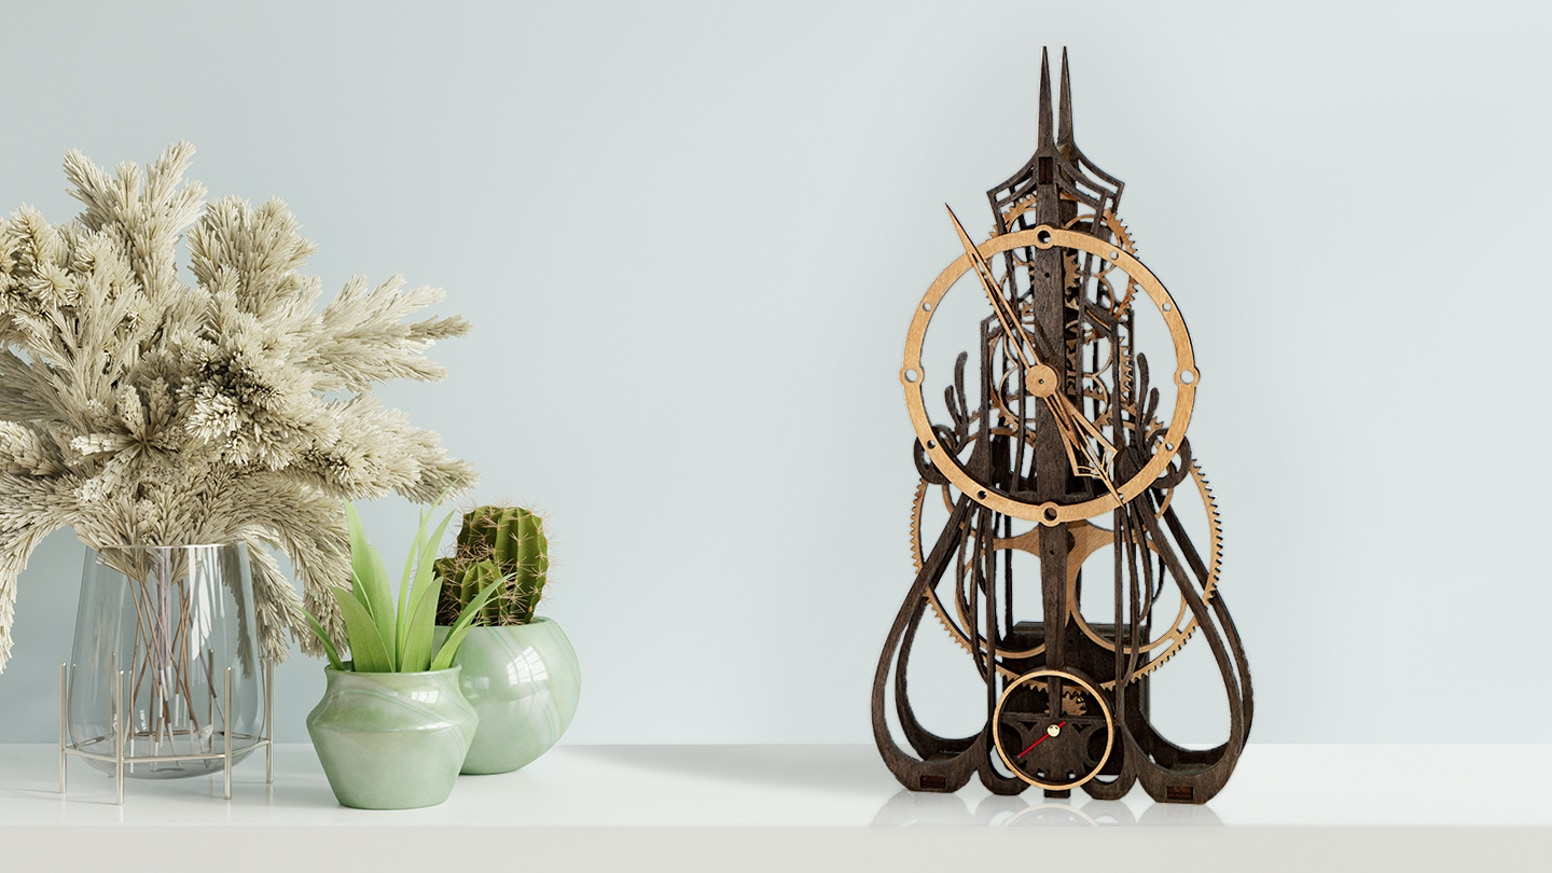 烏克蘭 3D 手作 DIY 木製時鐘 MadClockMaker